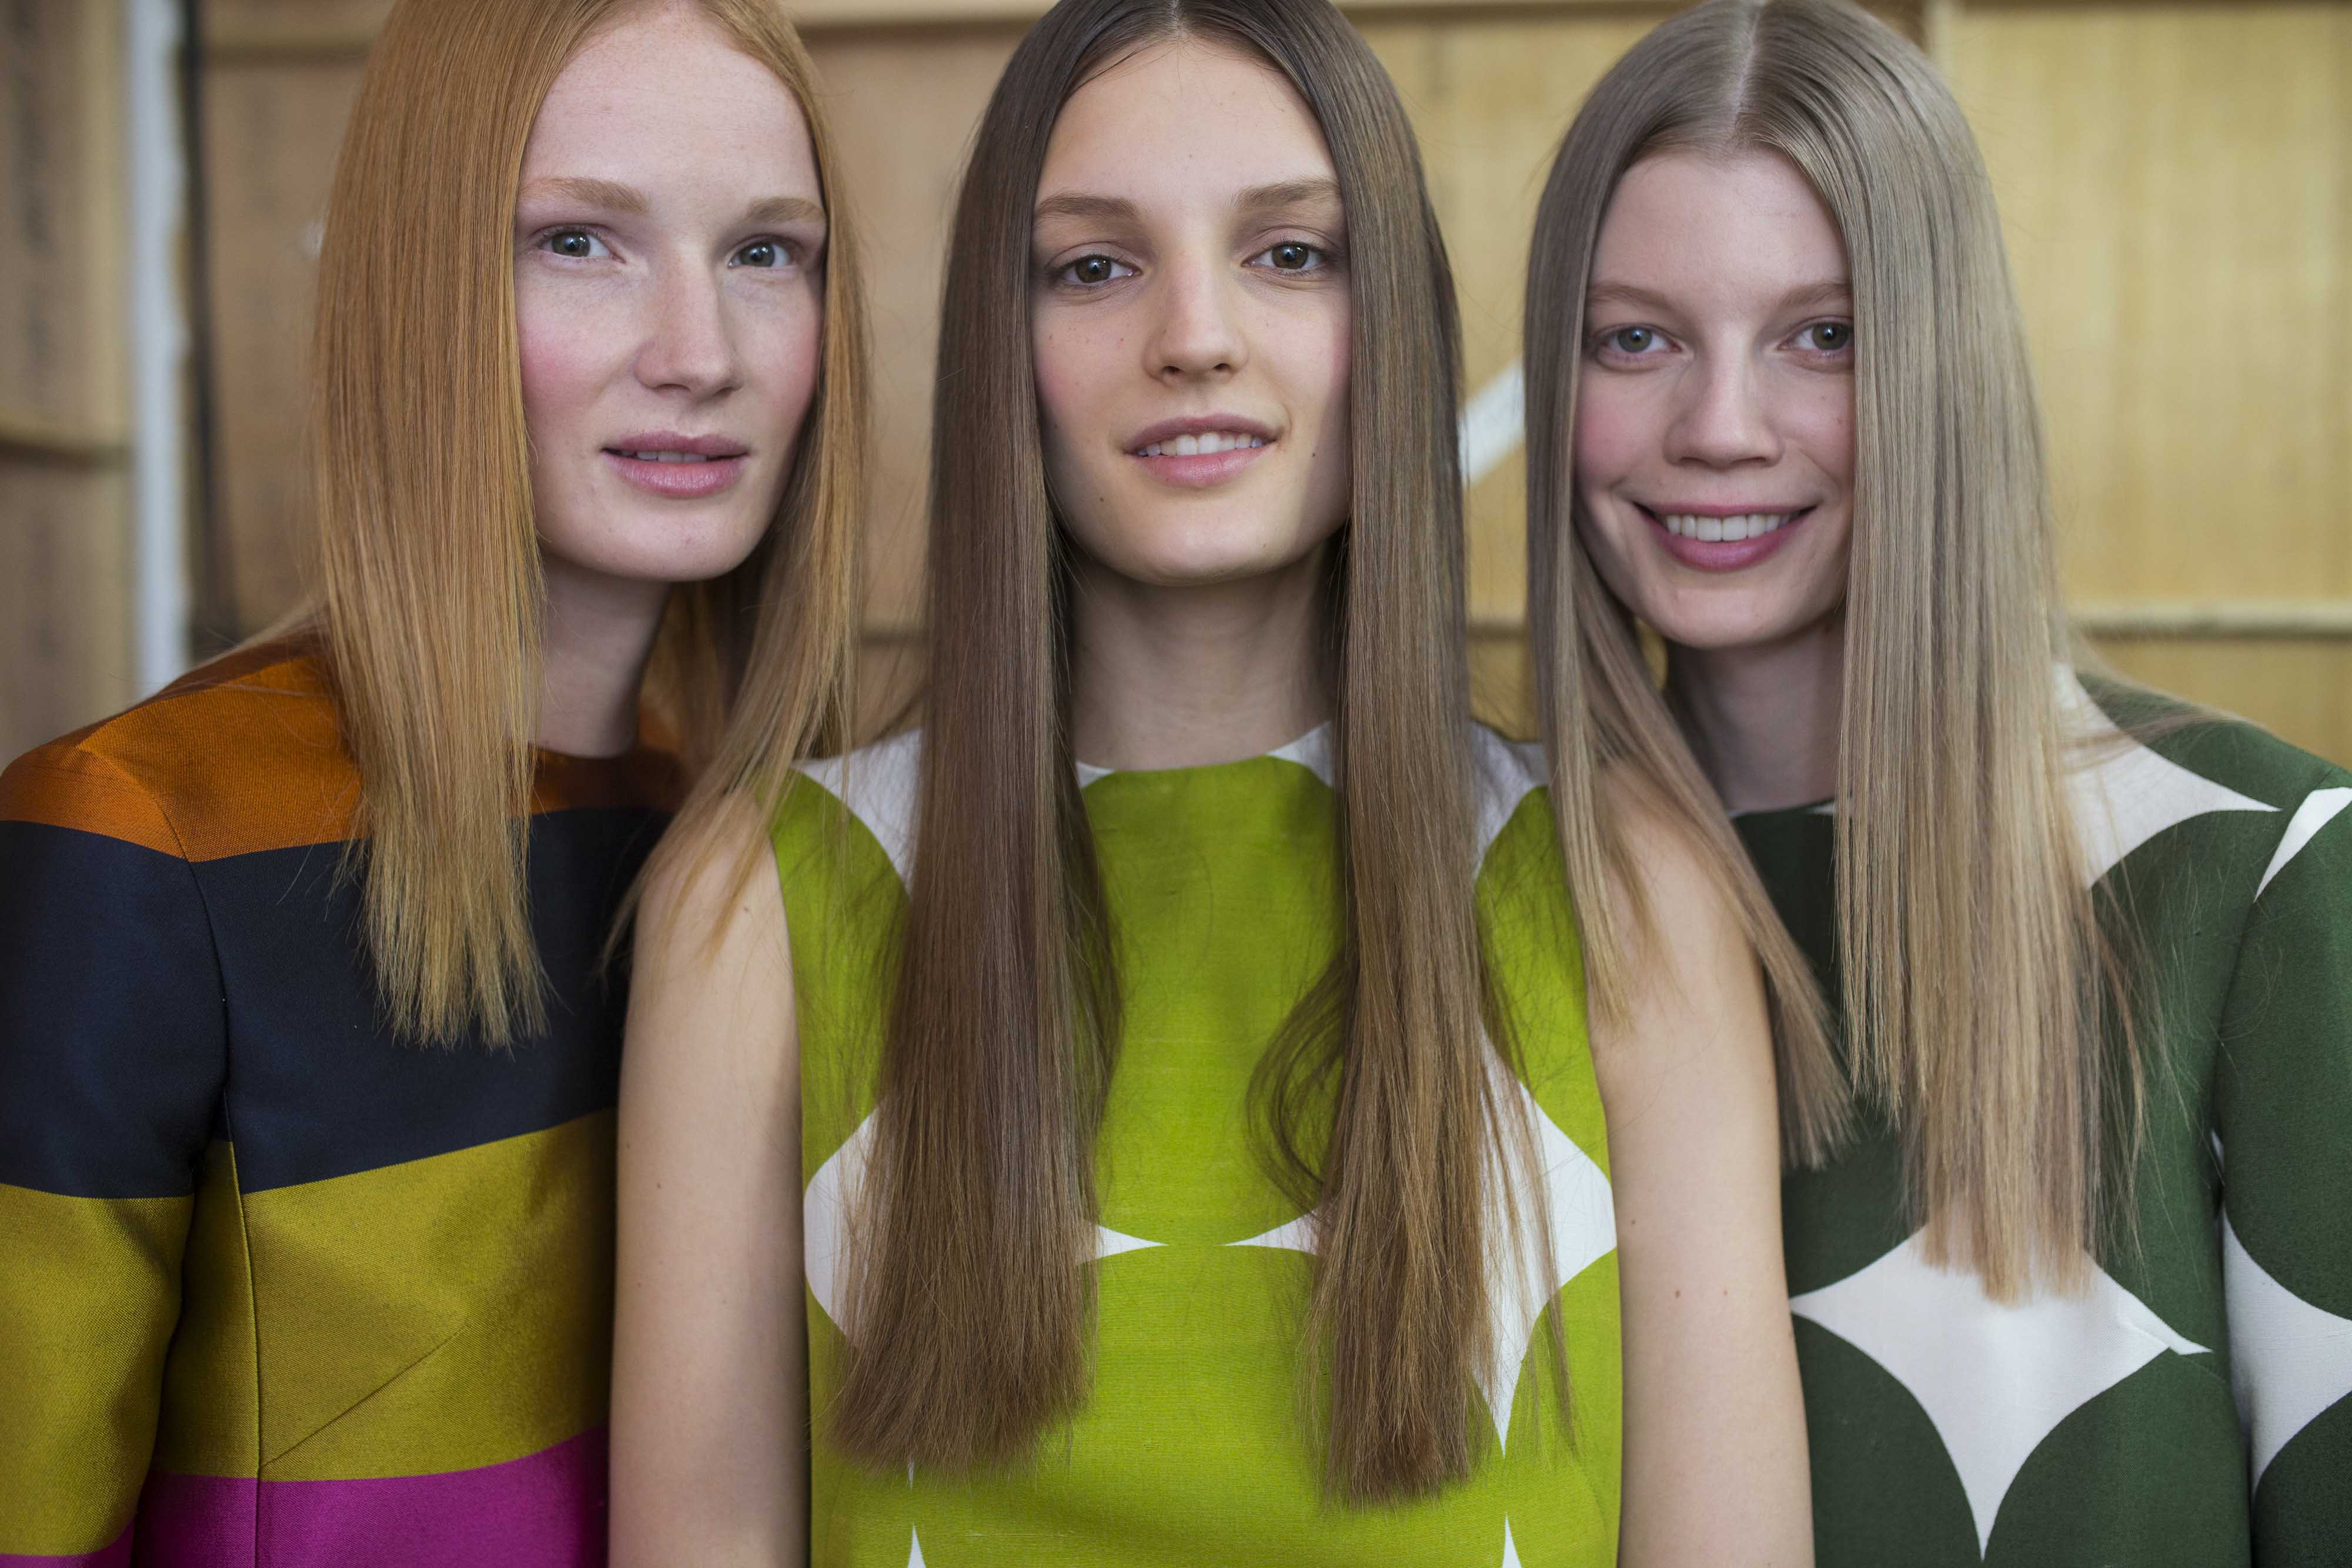 three women with long bone straight hair